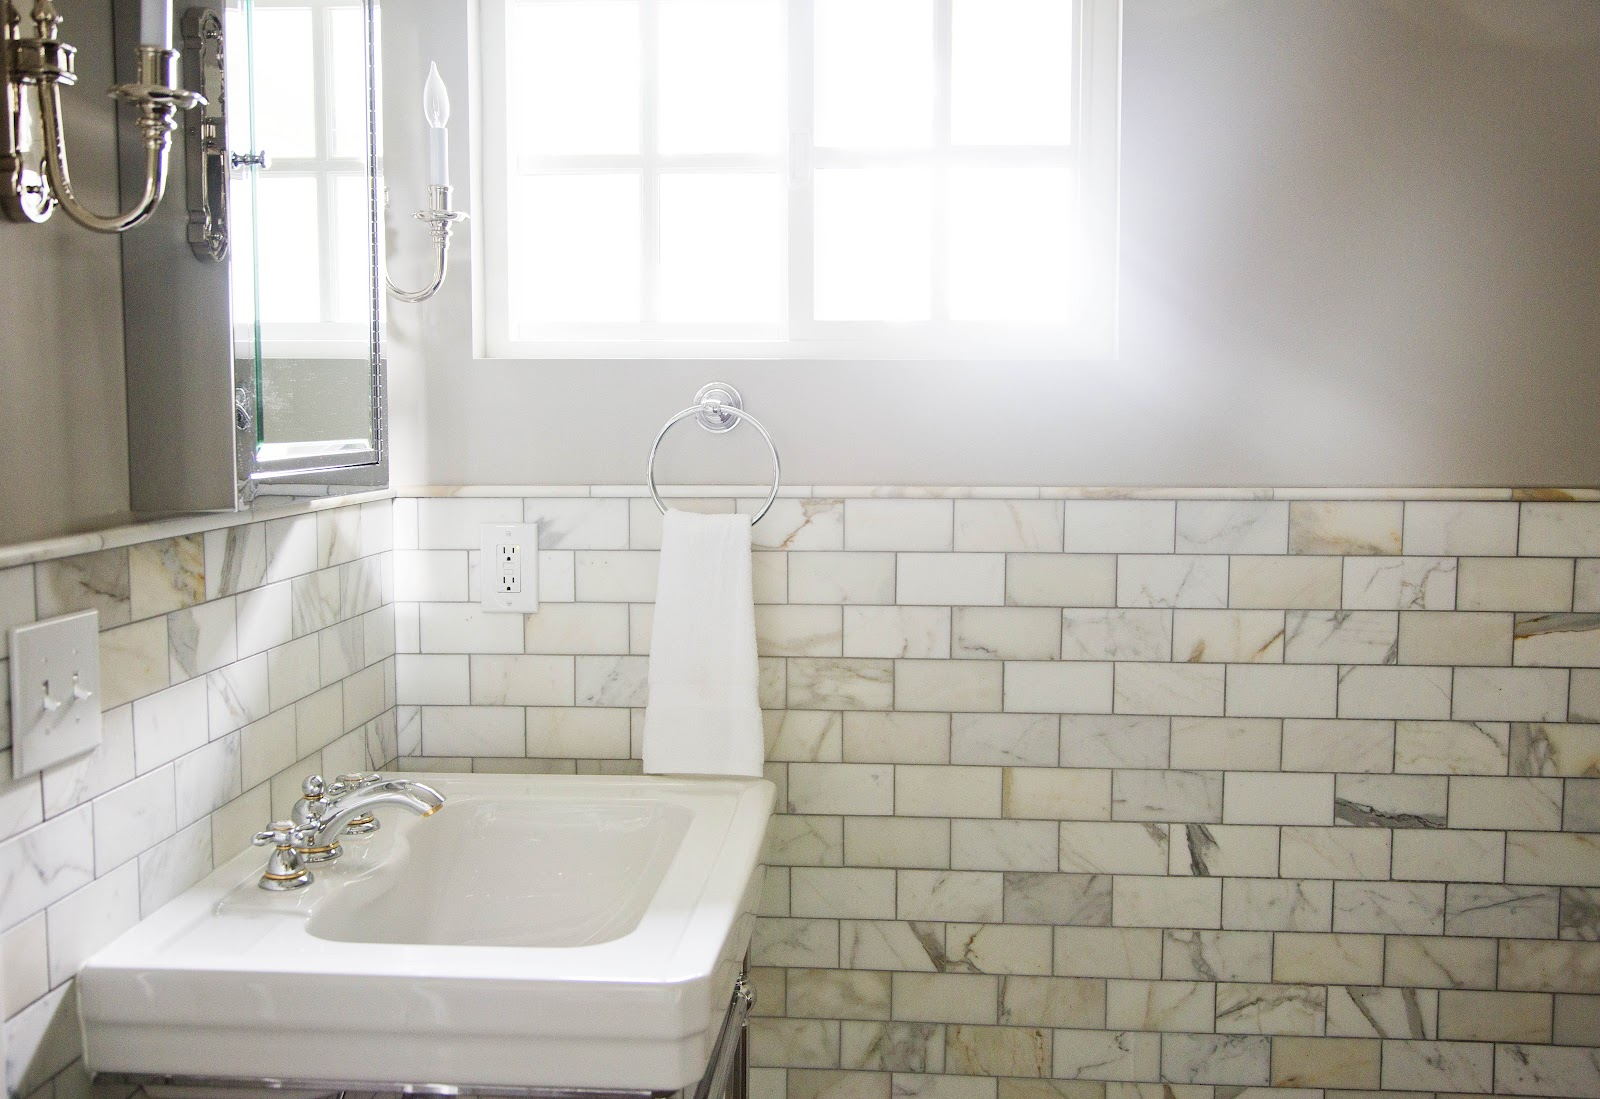 http://2.bp.blogspot.com/-QzxznLoYPZ0/T-PPvLlVolI/AAAAAAAAA48/UYCmgFZdaak/s1600/master+bath+detail.jpg